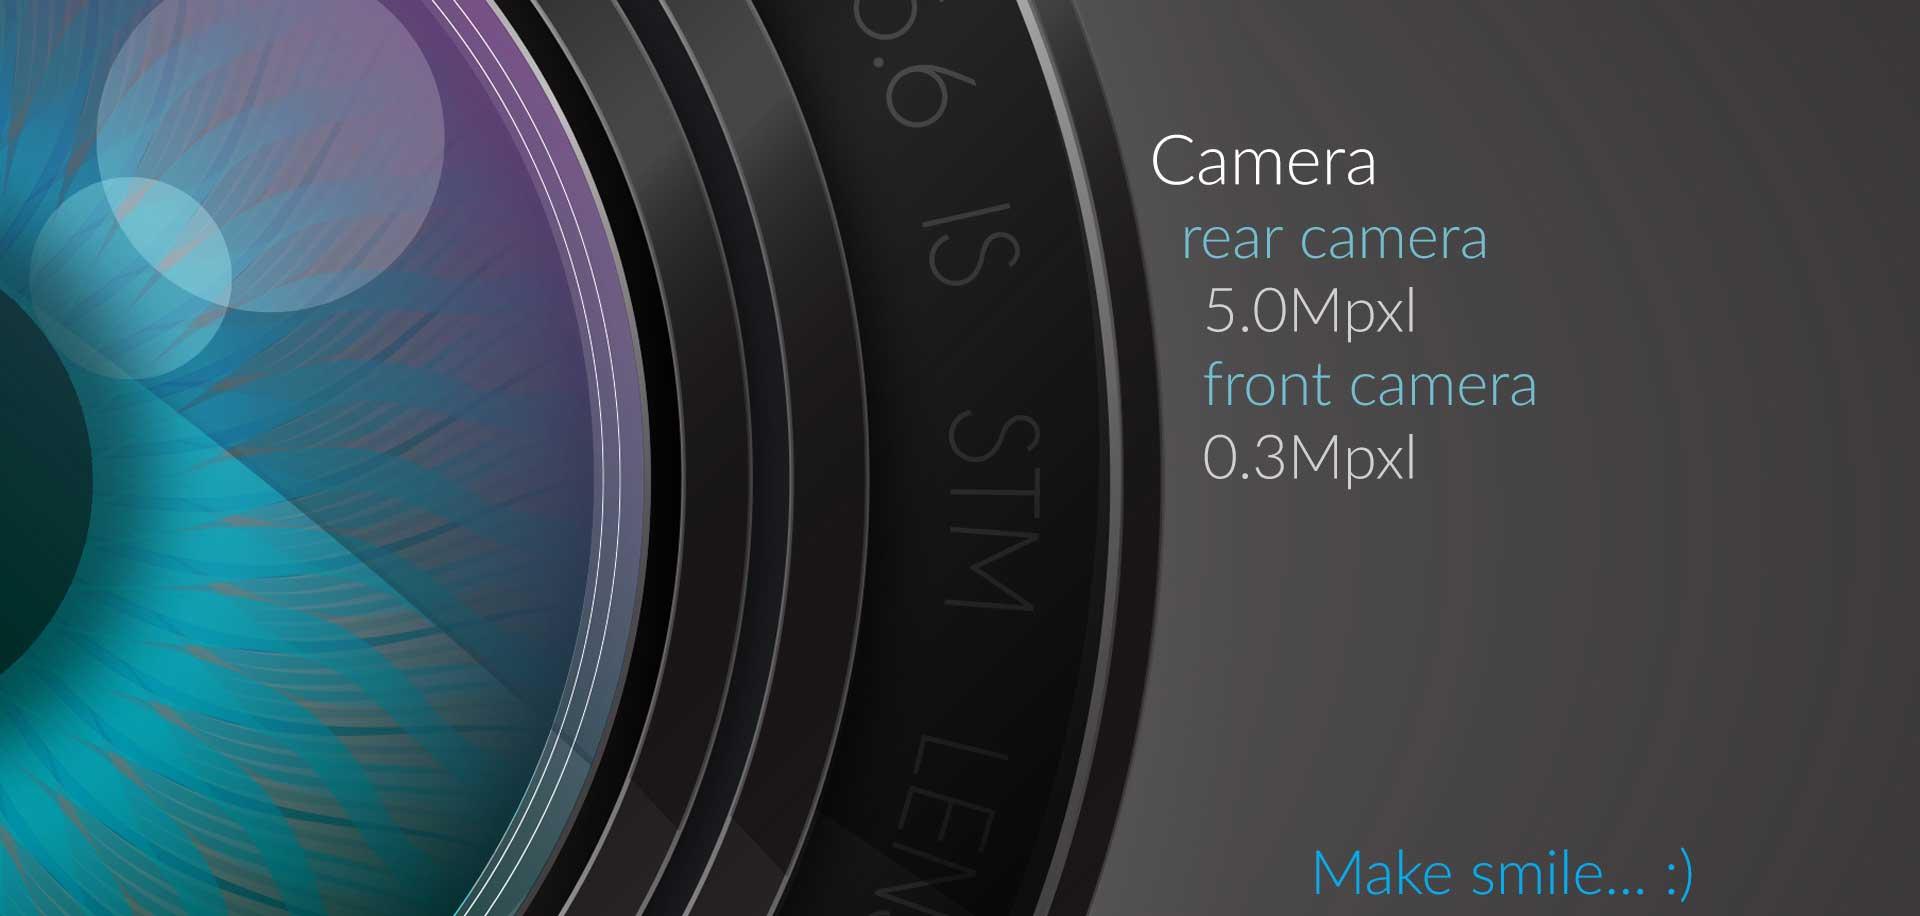 camera-706-b